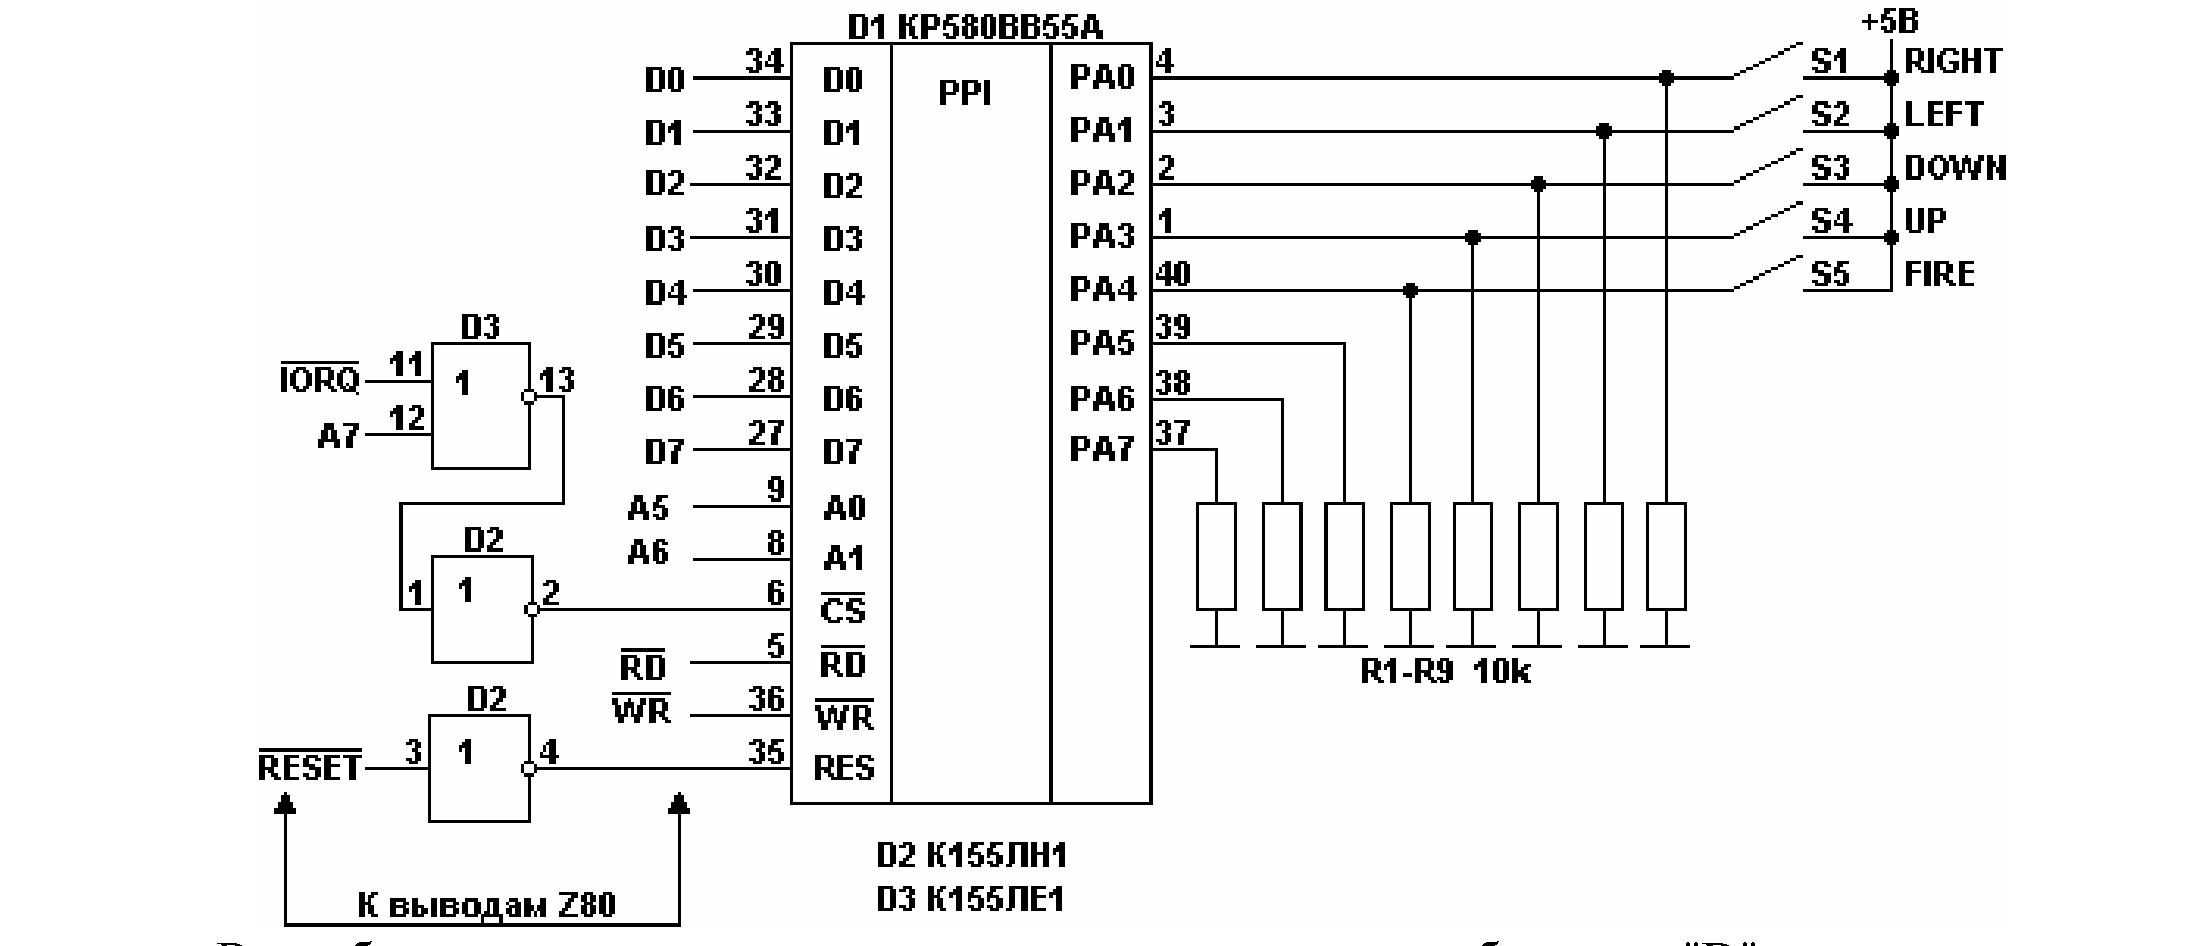 Расшифровка обозначений на кнопках и разъемах магнитол. gnd на схеме что означает